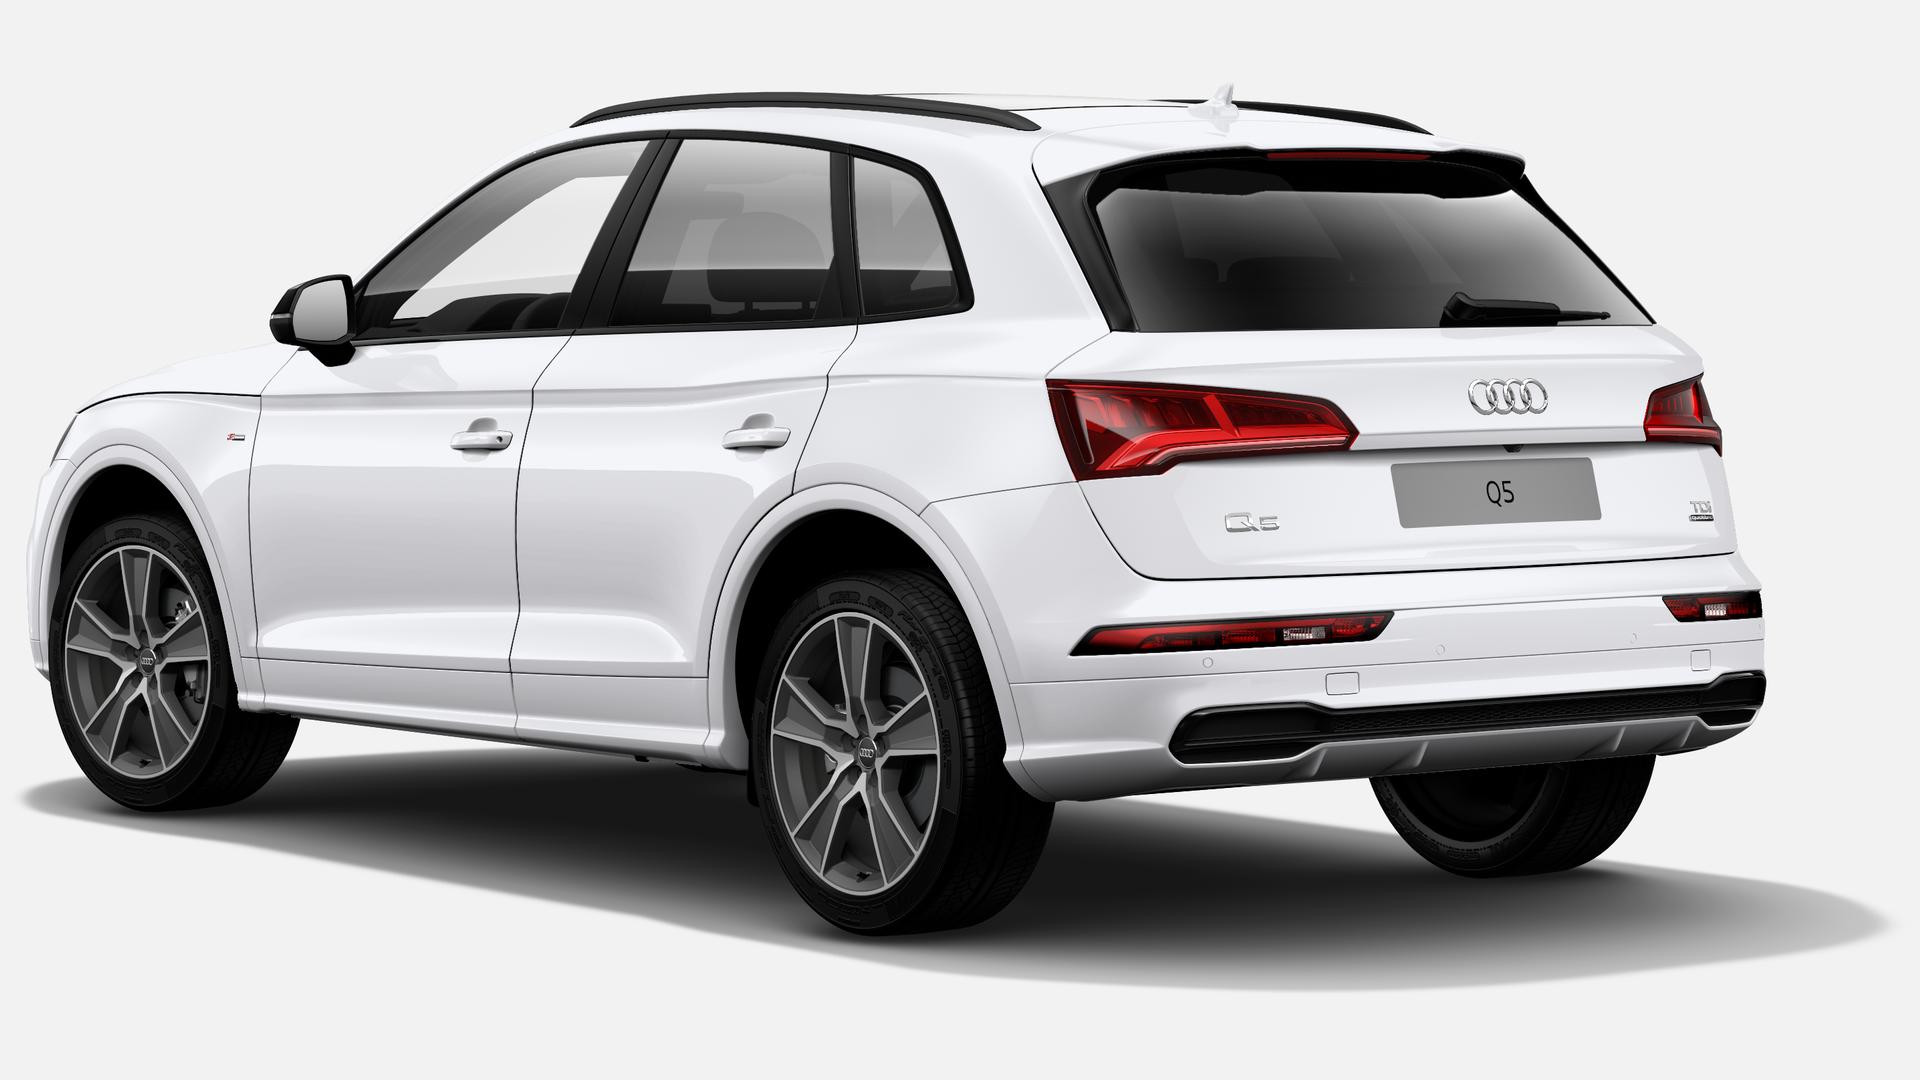 Audi Q5 2.0 TDI Black Line Quattro S Tronic 140 kW (190 CV)